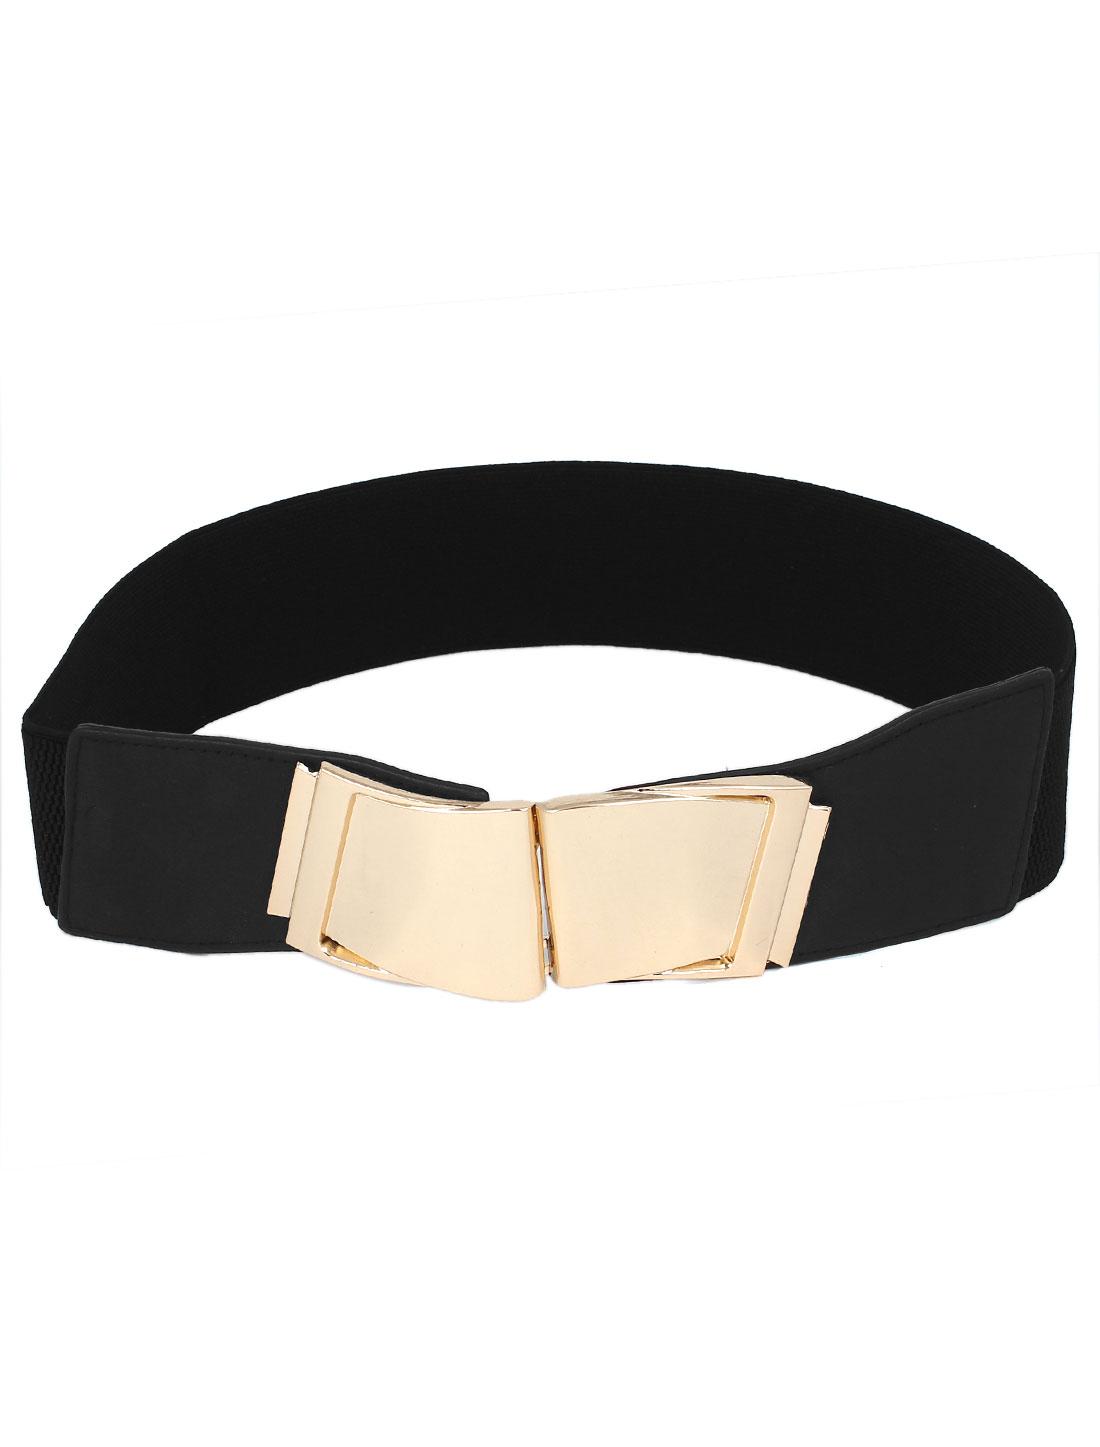 Women Metal Interlock Buckle Faux Leather Stretchy Cinch Waist Belt Waistband Black